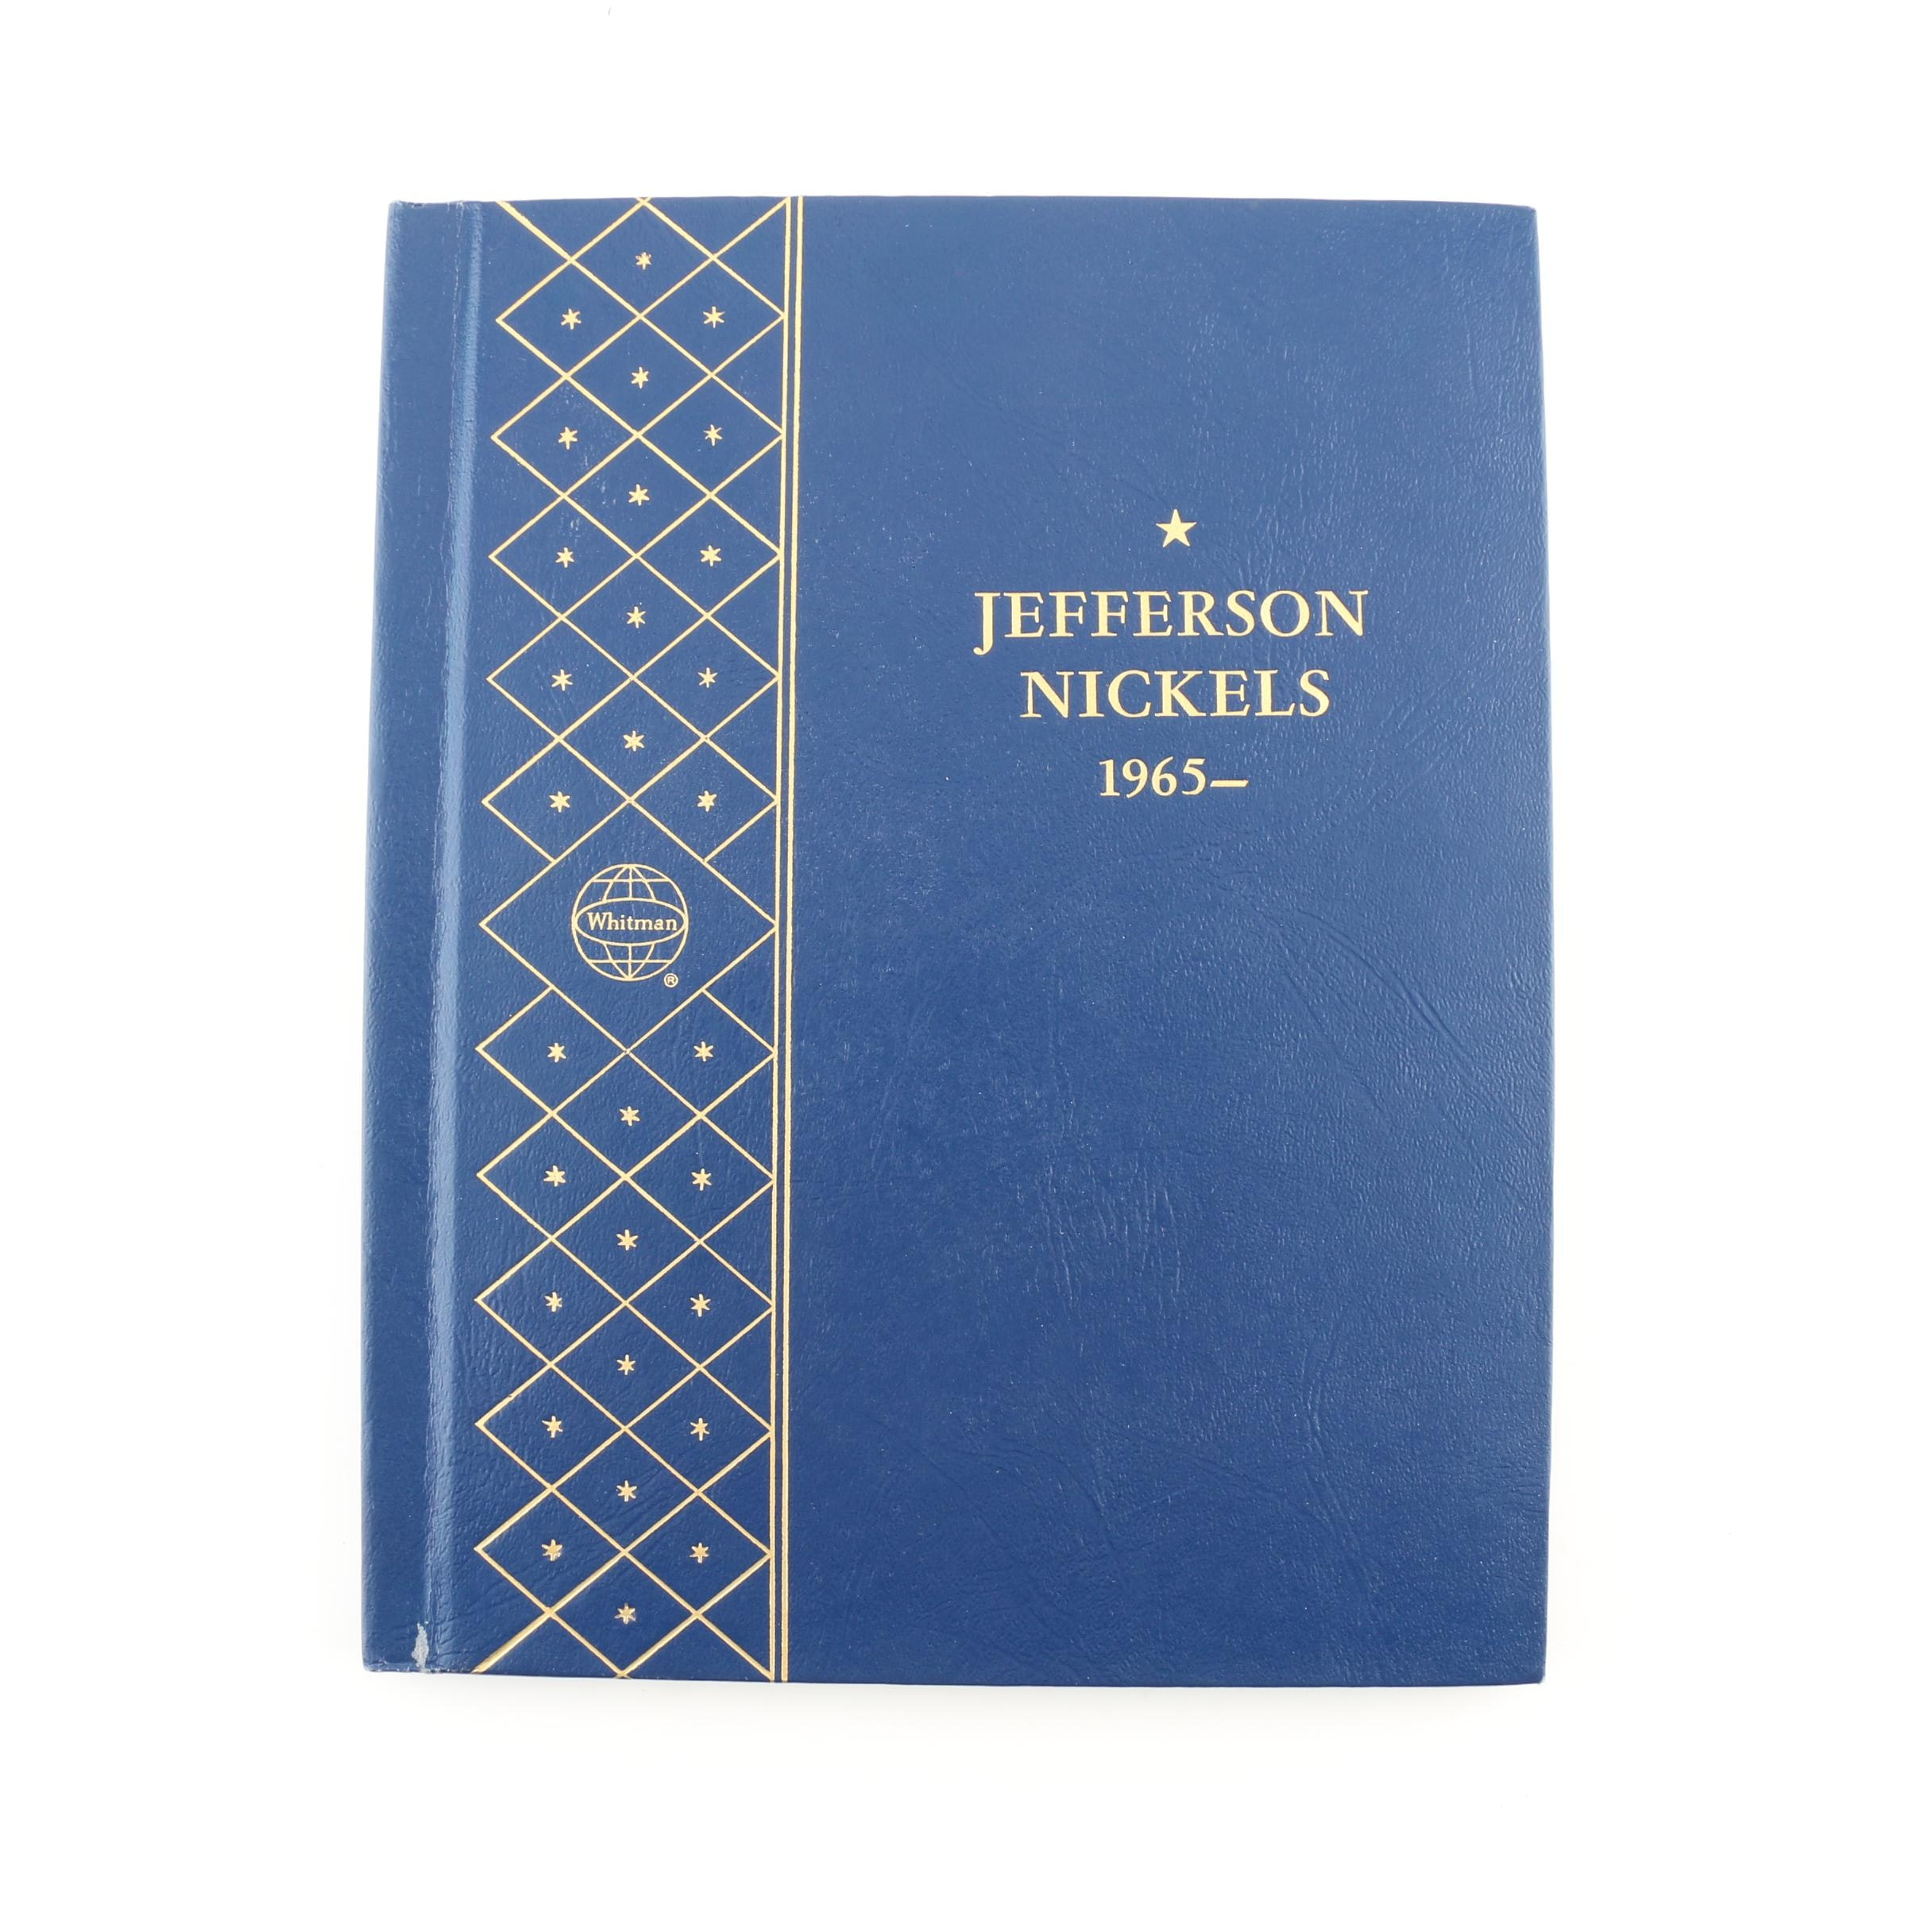 Whitman Binder of Jefferson Nickels